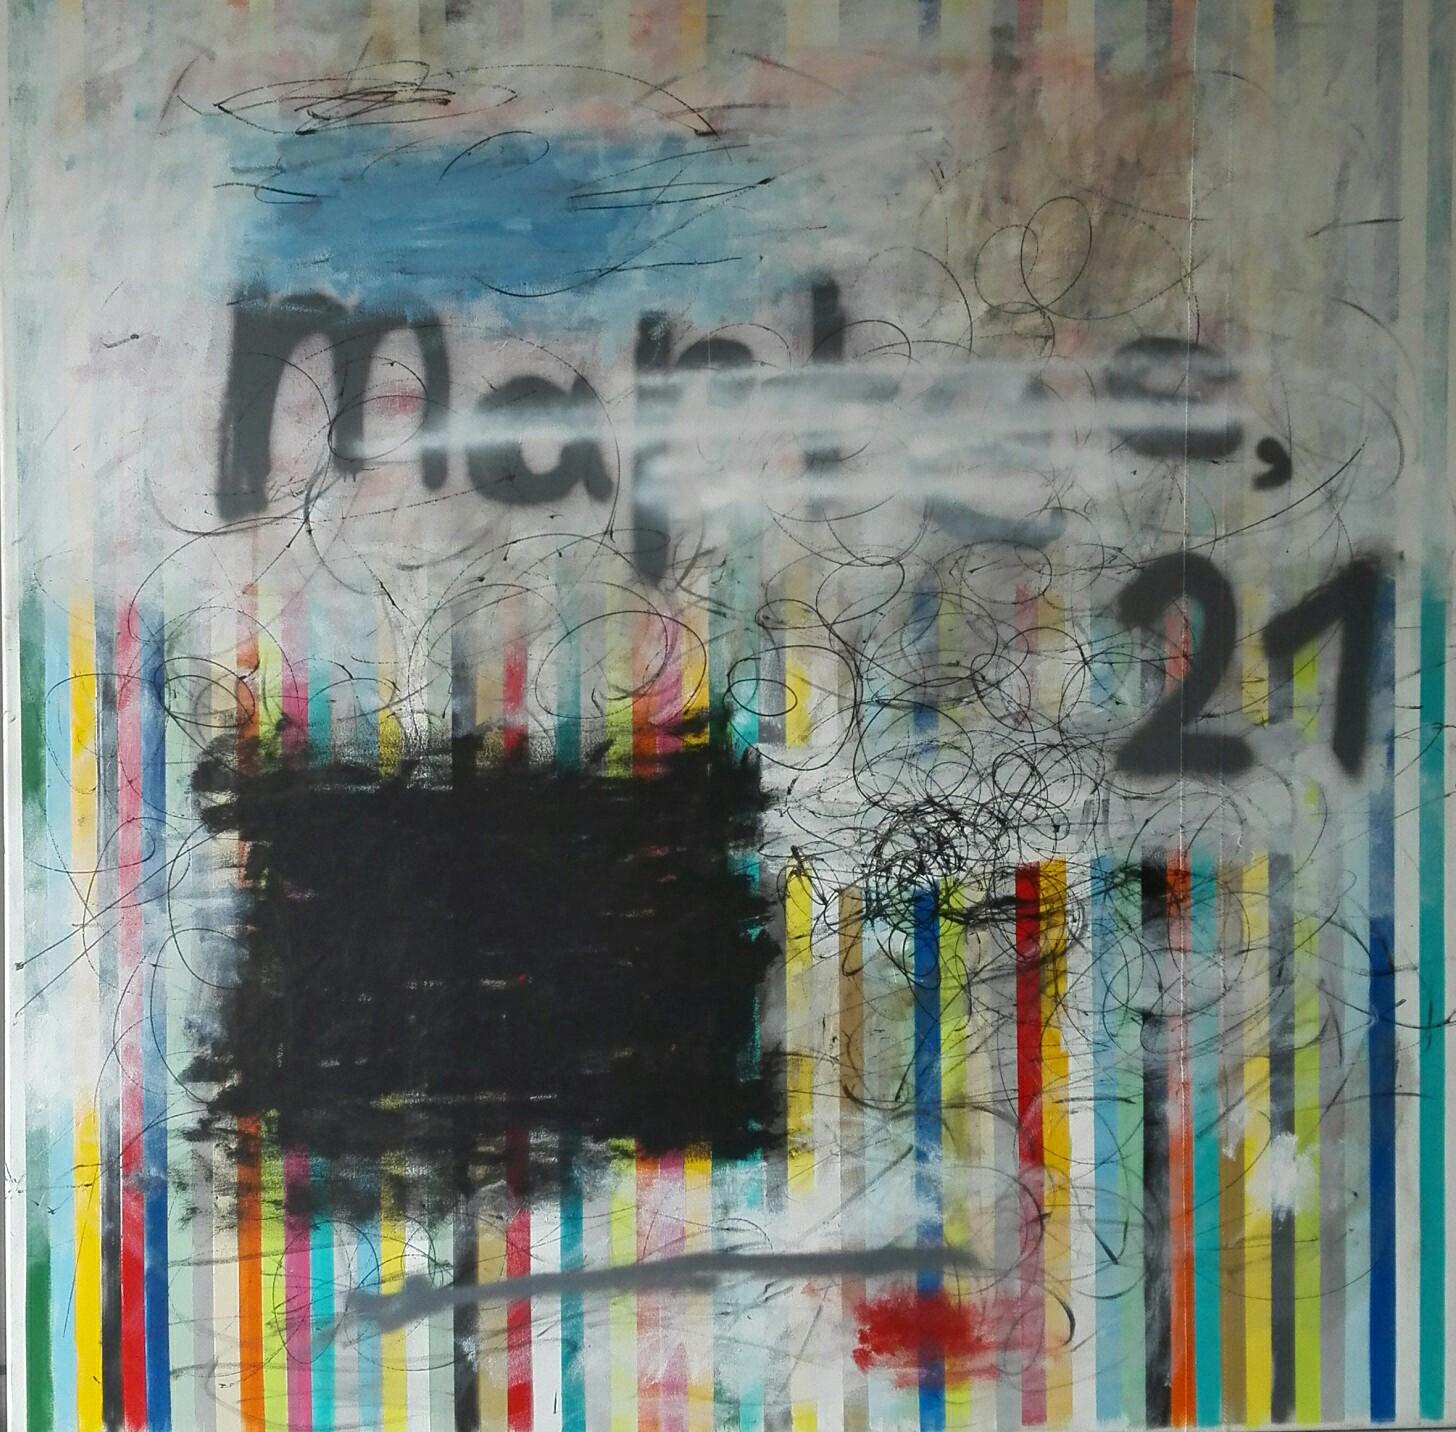 De lala serie abecedario (2016) - Julio Parra